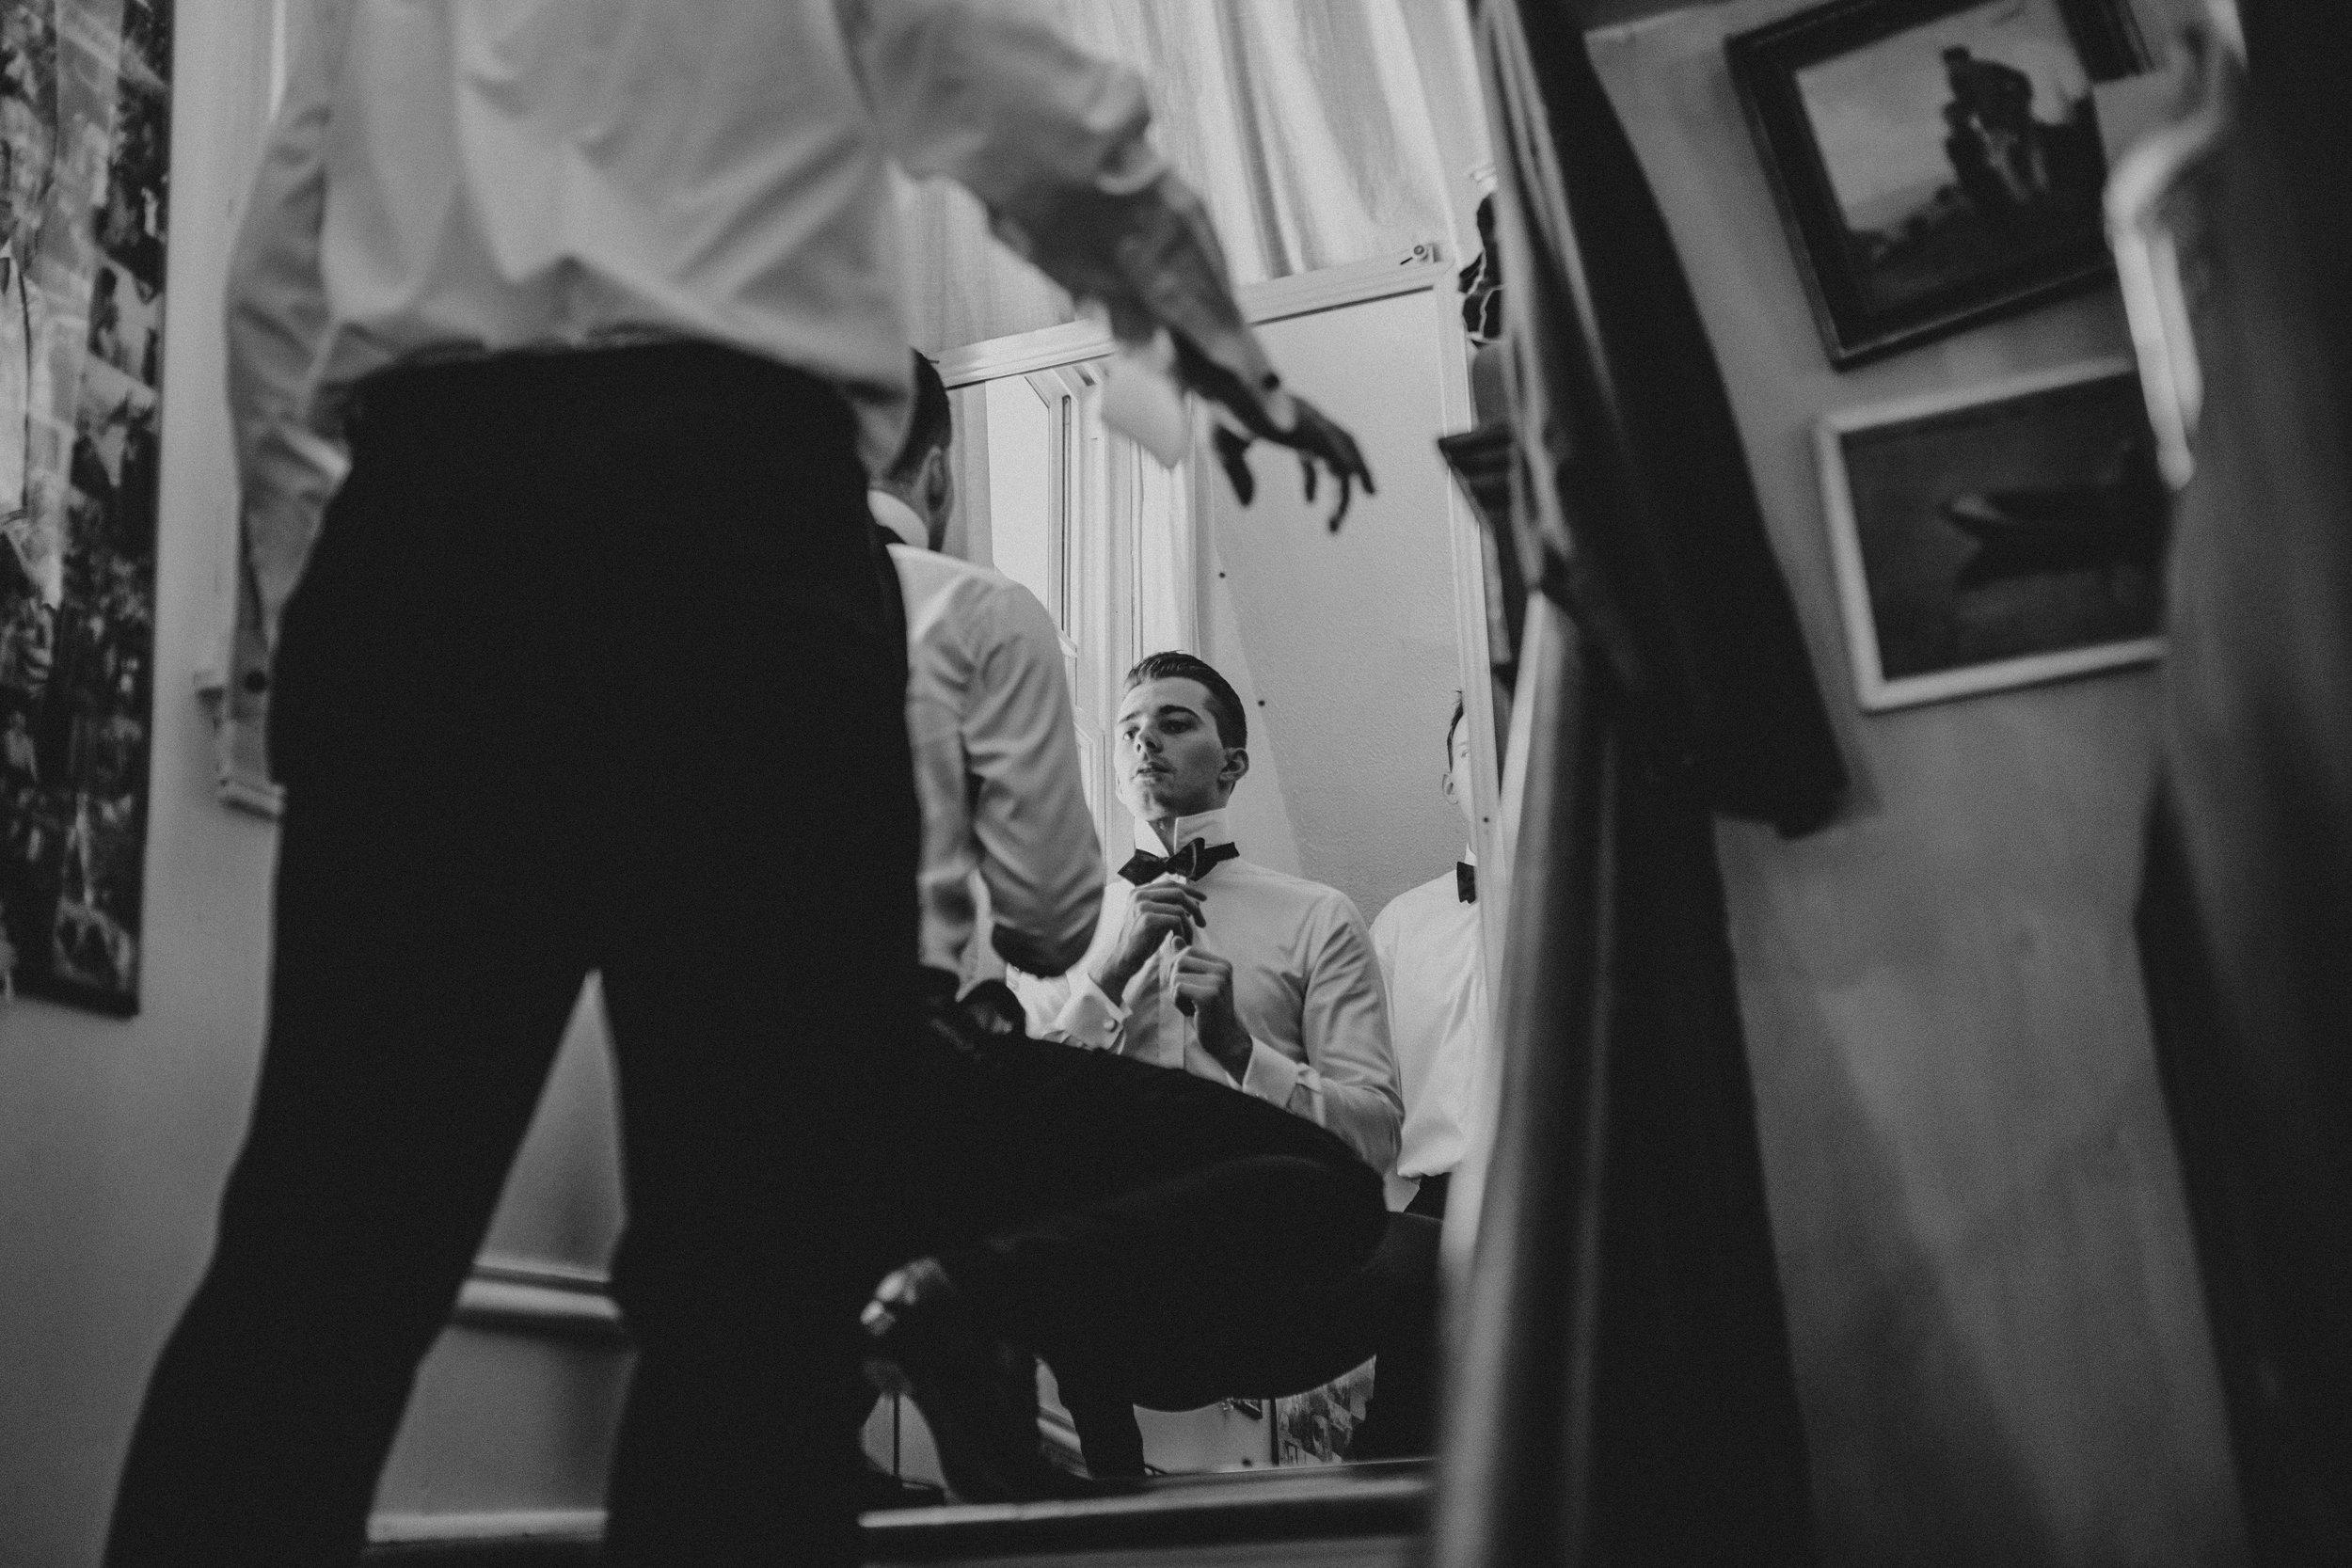 Chicago Photographer, Wedding Photographer, Chicago Wedding Photographer, Oregon Photographer, Portland Photographer, Oregon Wedding Photographer, Portland Wedding Photographer, Wedding Photography, New York Wedding Photography, New York Wedding Photographer, Darling, Lookslikefilm, Kinfolk, Canon, New York Wedding Photography, Chicago Wedding, Ravenswood Event Center, Redden Photography, Redden Wood, Redden, San Diego Photography, San Diego Wedding Photography, San Diego Wedding Photographer, San Diego Photographer, San Francisco Wedding Photography, San Francisco Wedding Photographer, San Francisco Wedding Photography, Washington D.C. Wedding Photographer, Washington D.C. Wedding Photography, Charleston Wedding Photography, Charleston Wedding Photographer, Seattle Wedding Photography, Seattle Wedding Photographer, Nashville Wedding Photography, Nashville Wedding Photographer, Free People Weddings, Chicago, Nashvile, Seattle, New York City, San Francisco, Santa Barabara, San Diego, Indian Weddings, Indian Bride, Indian Wedding Photography, Washington D.C.